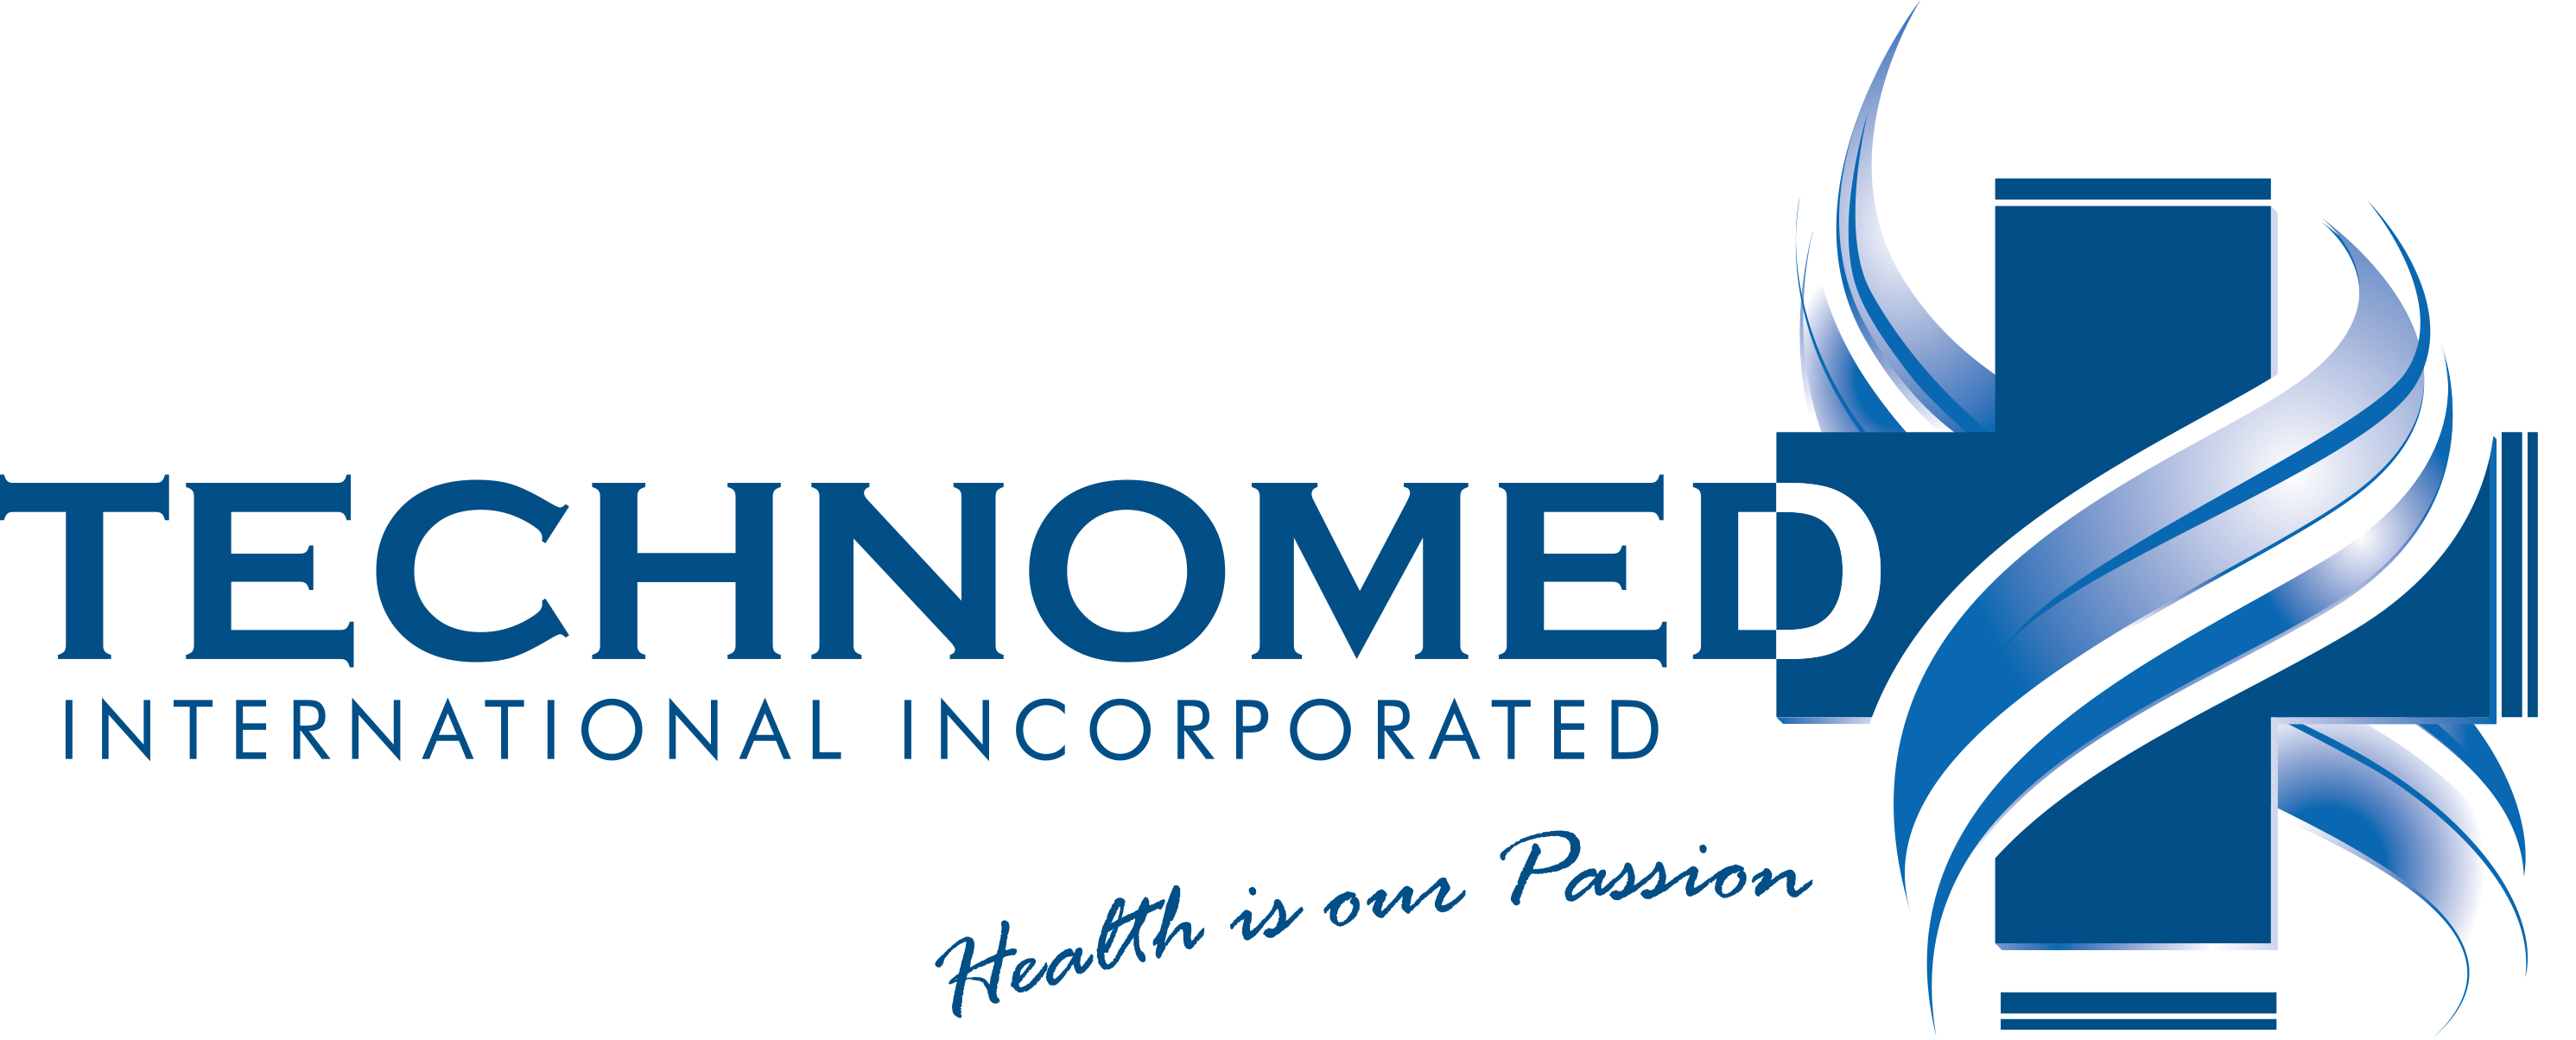 Technomed International Inc.